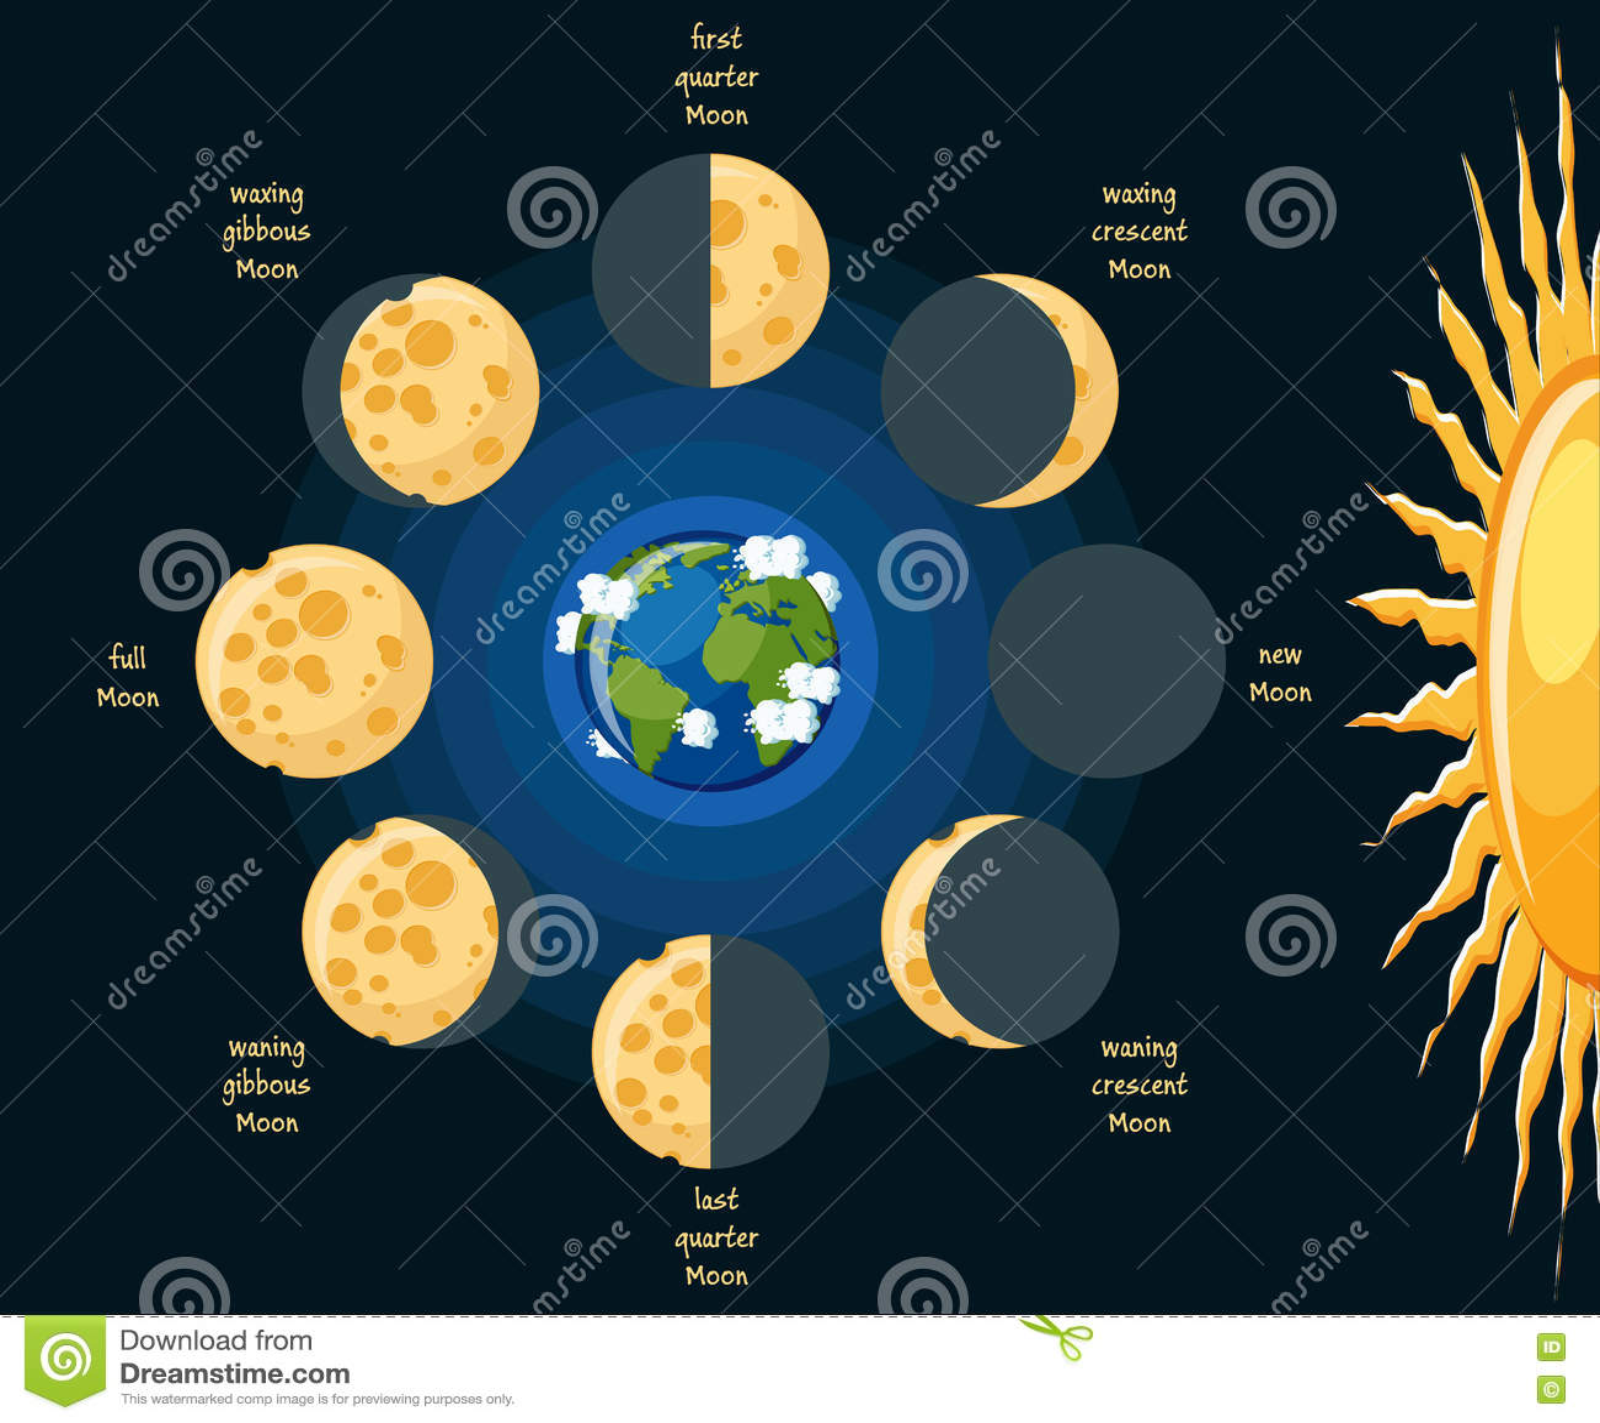 Lunar Moon Phases Worksheet